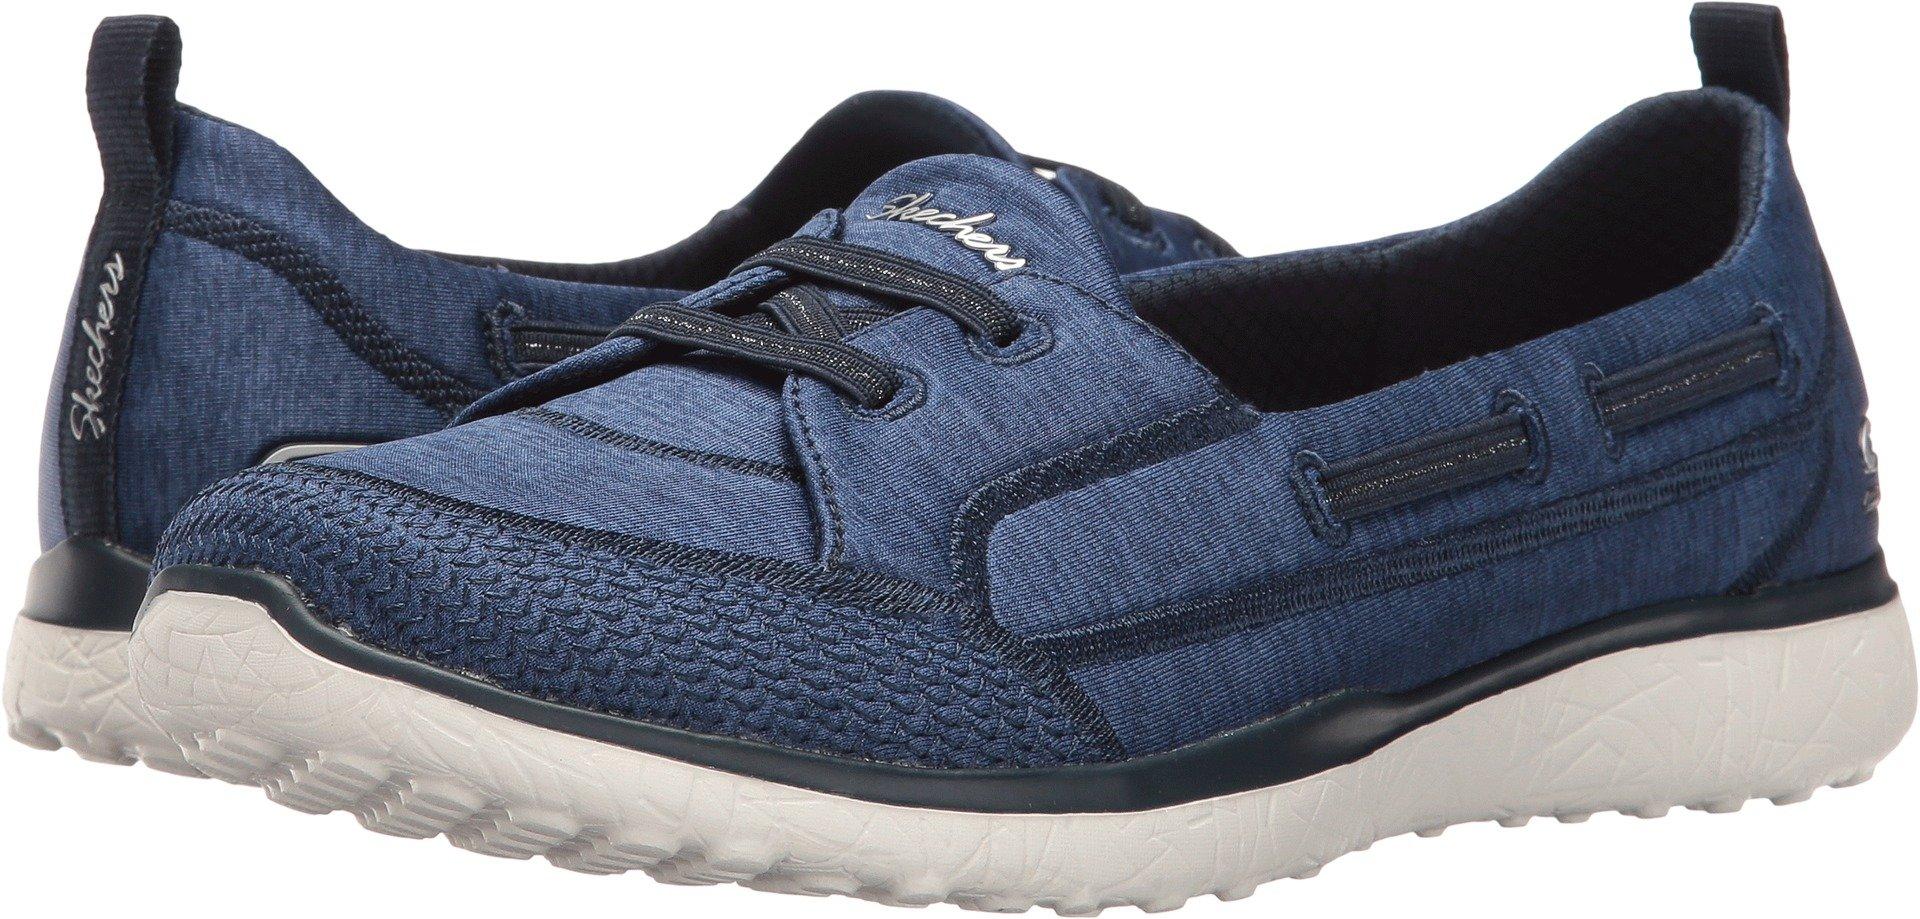 Skechers Microburst Topnotch Womens Slip On Sneakers Navy 9.5 W